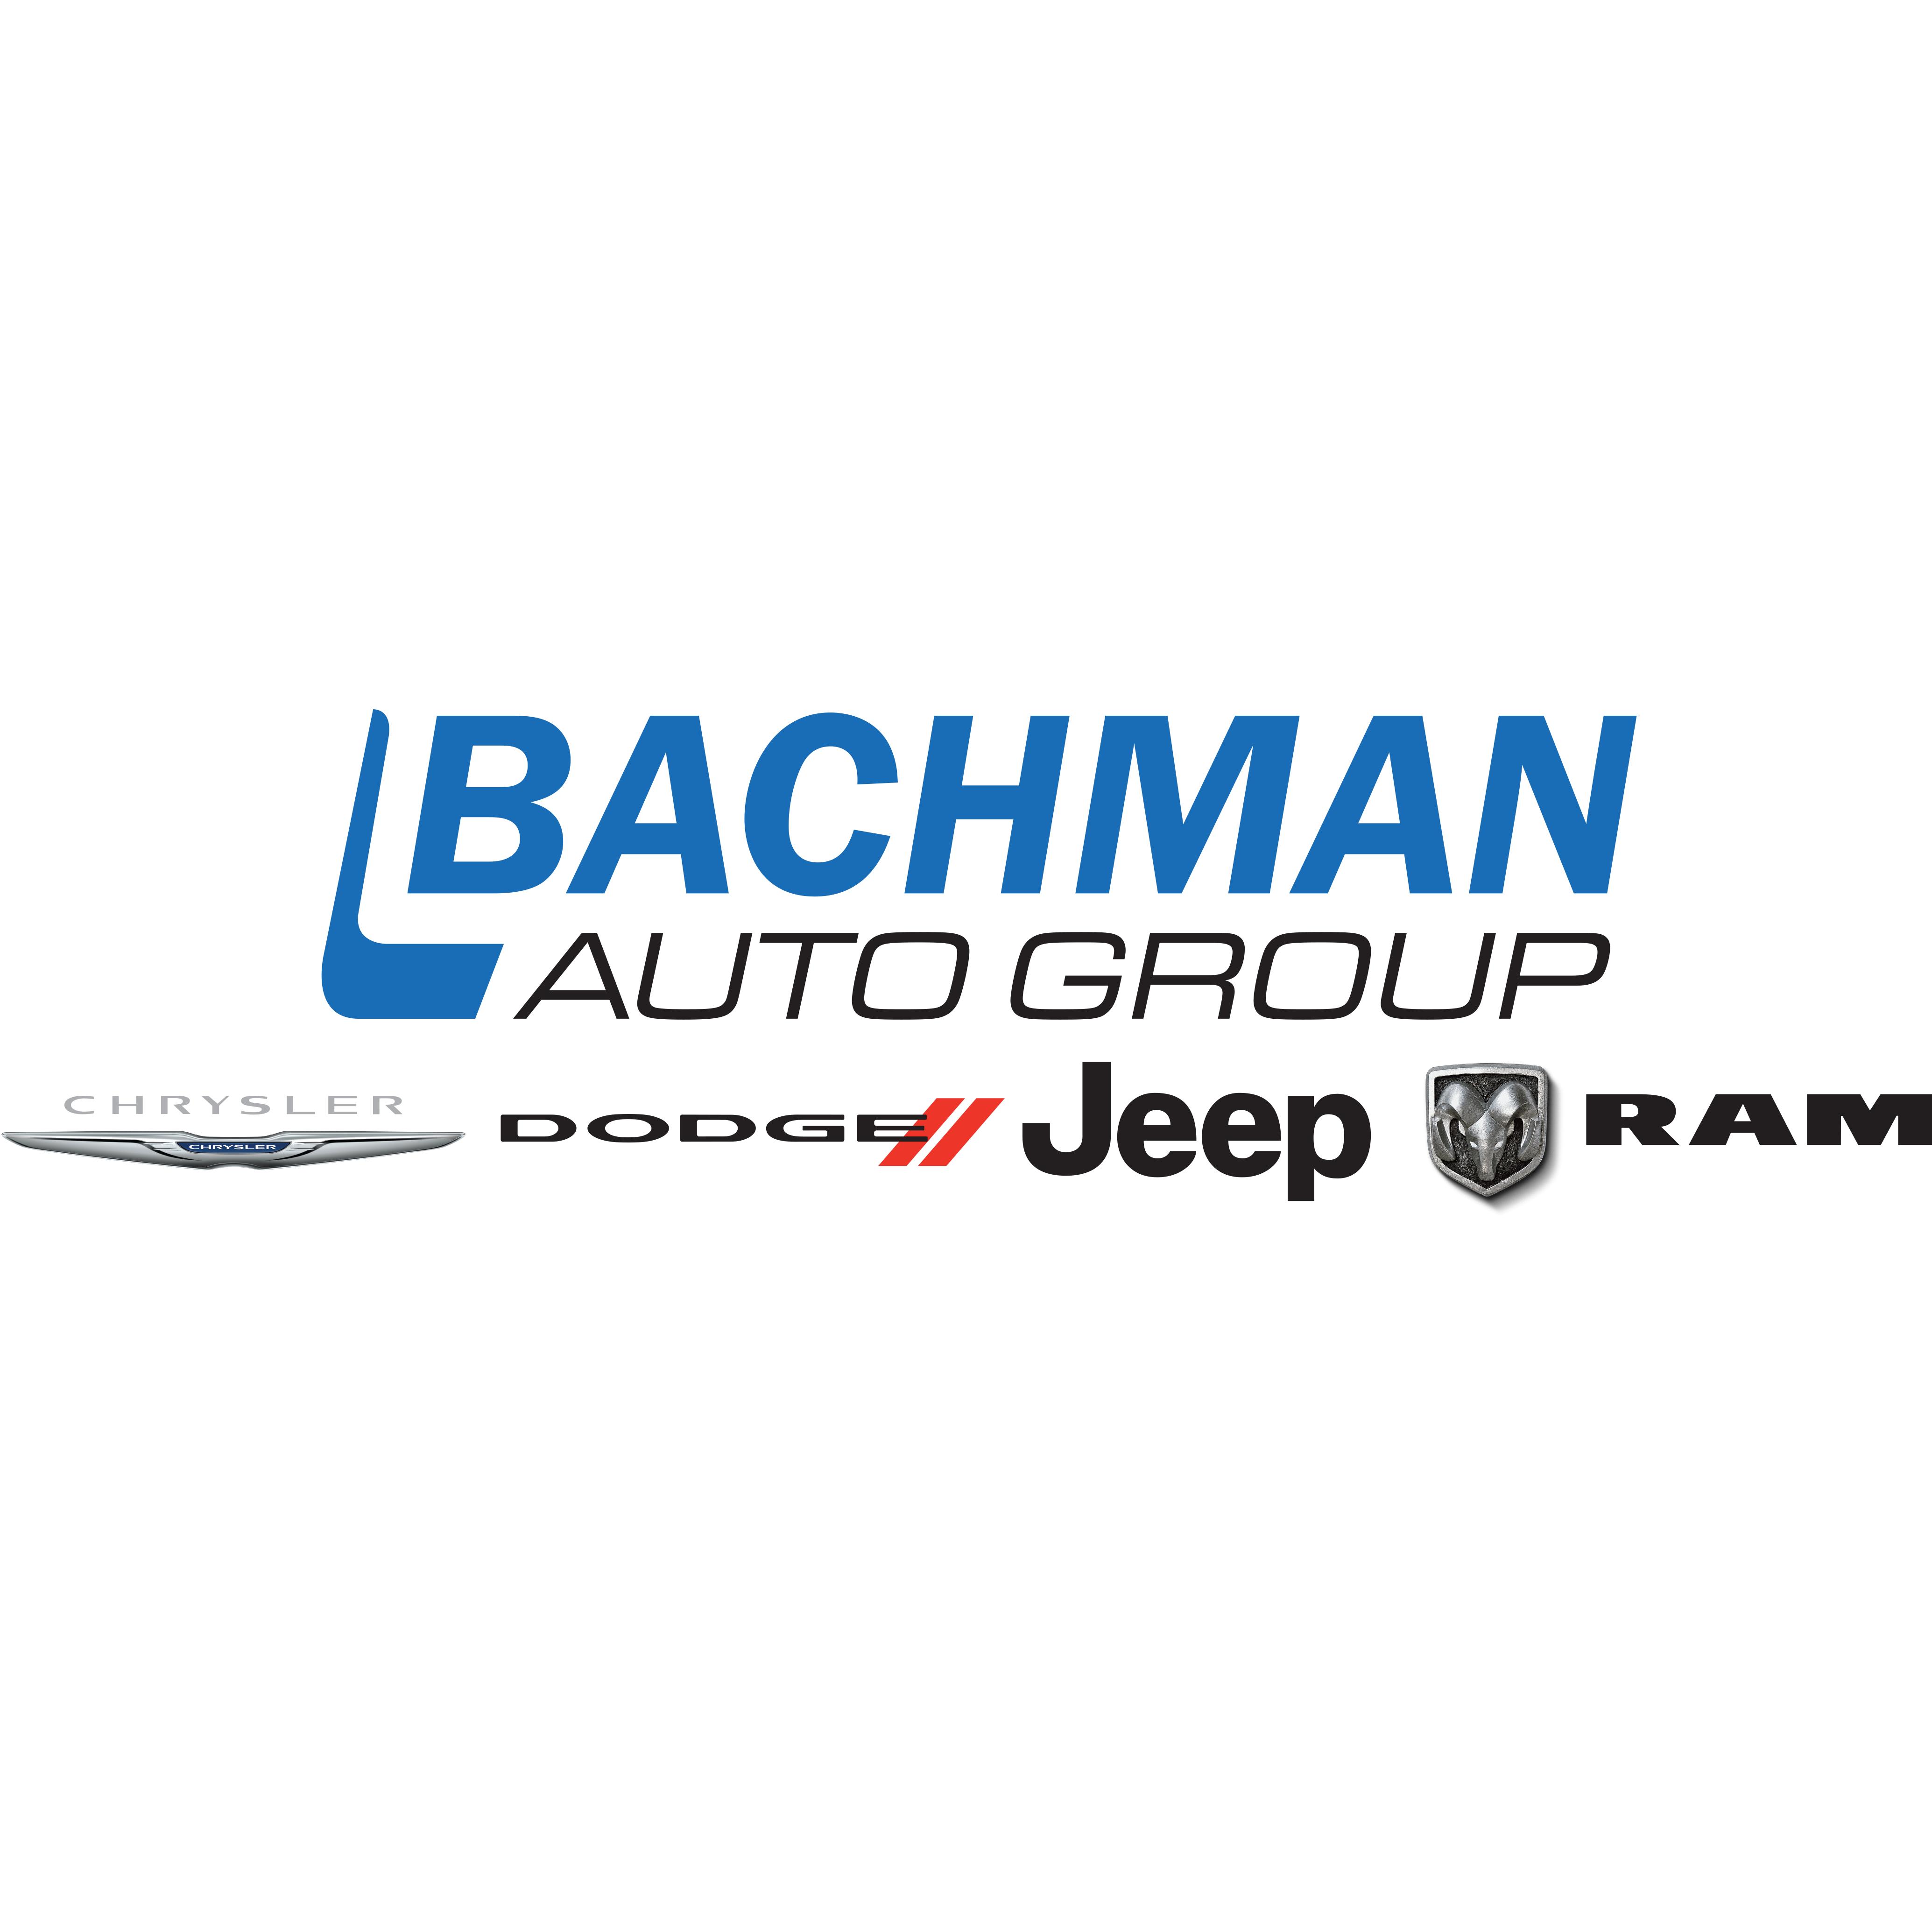 Bachman Chrysler Dodge Jeep Ram Jeffersonville Indiana